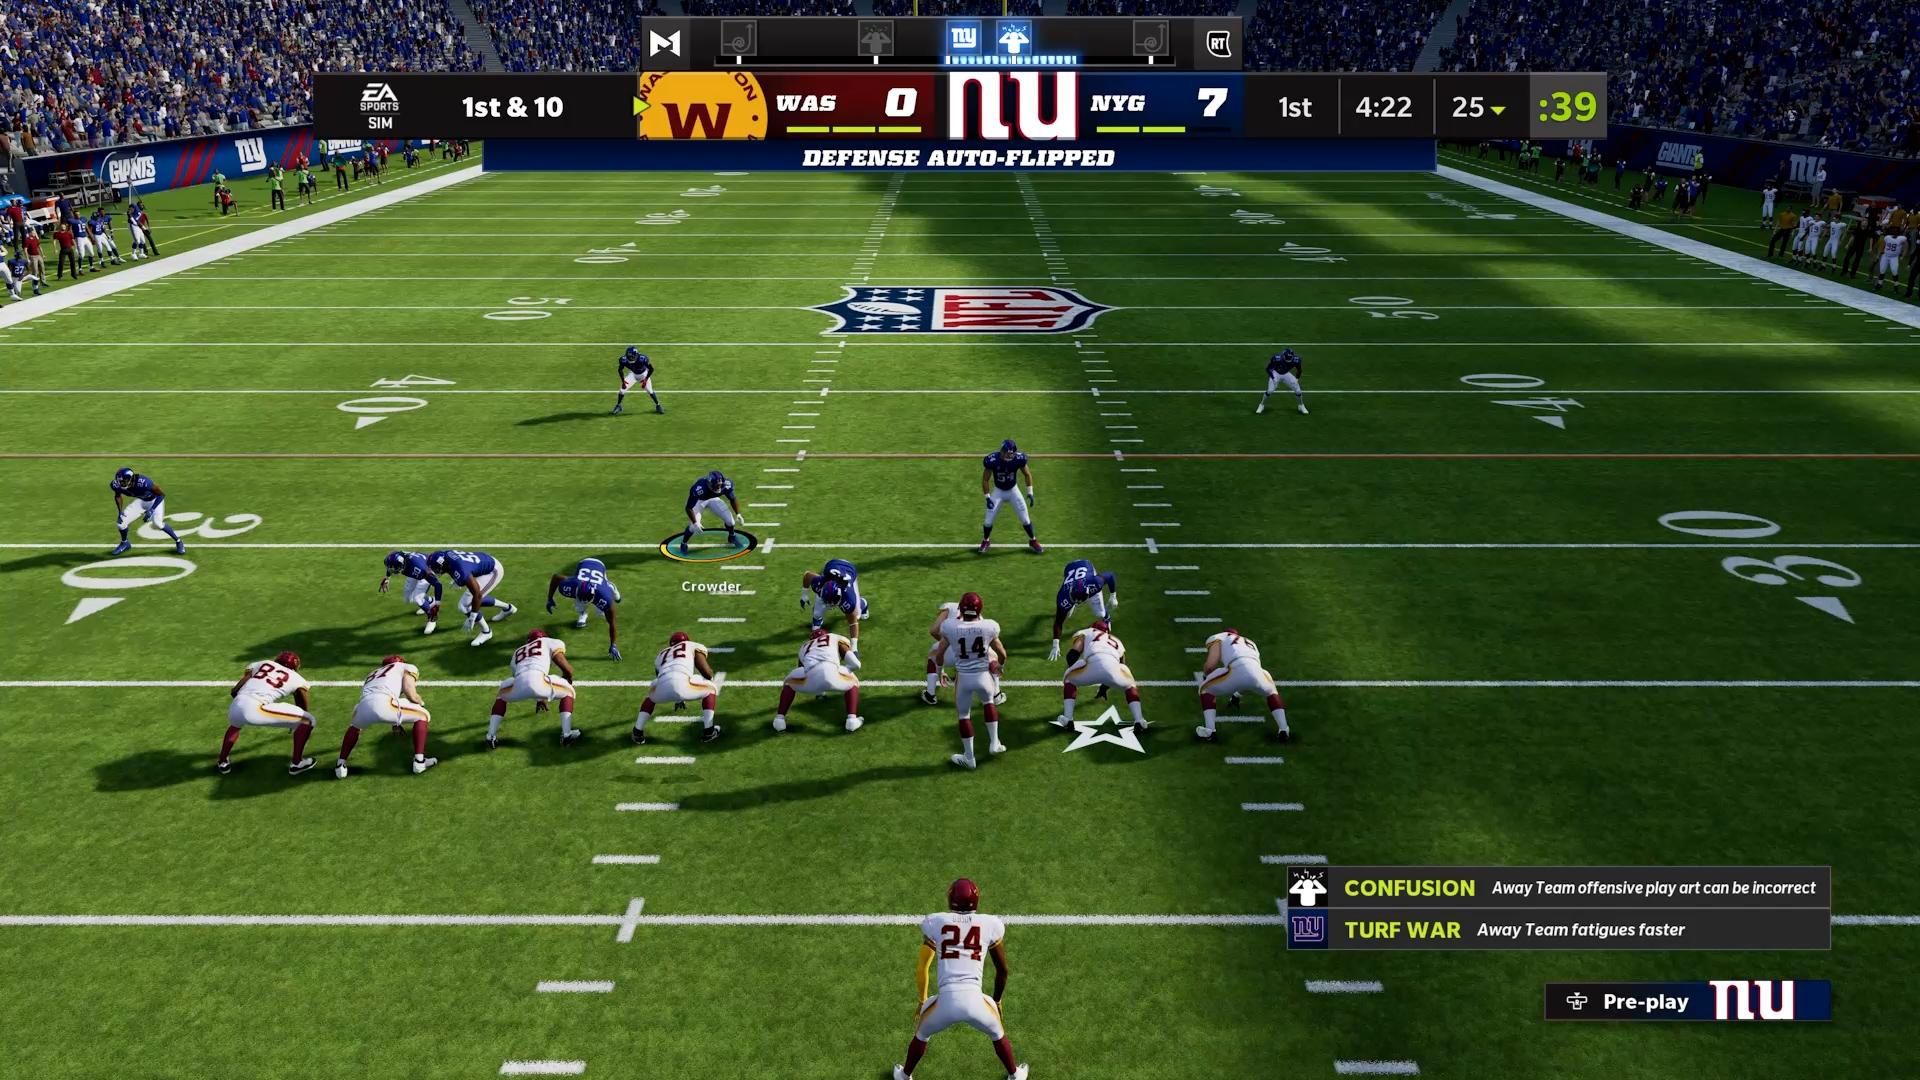 Madden NFL 22 Giants defense on field